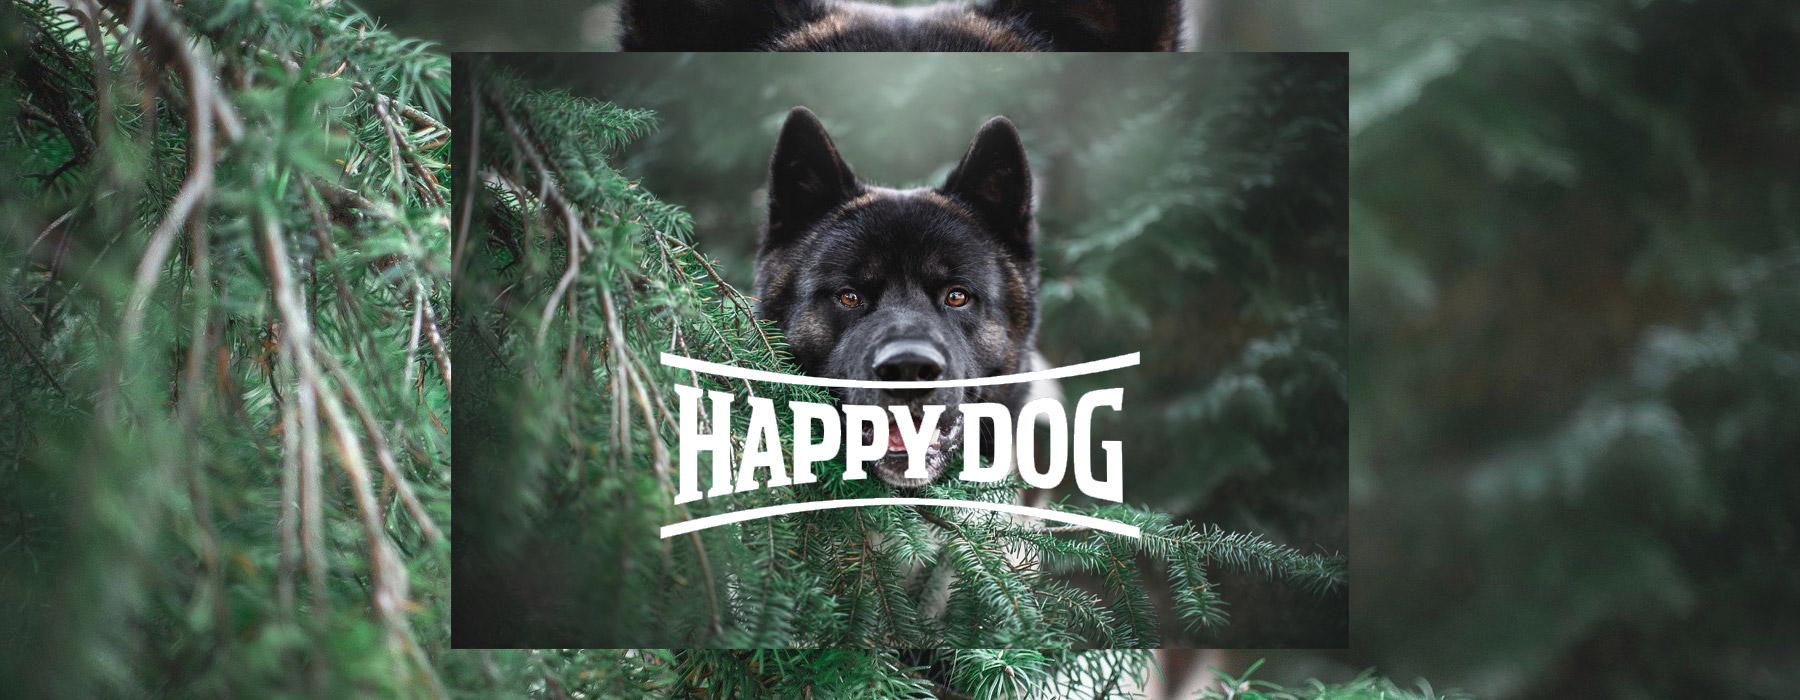 Happy Dog SEO